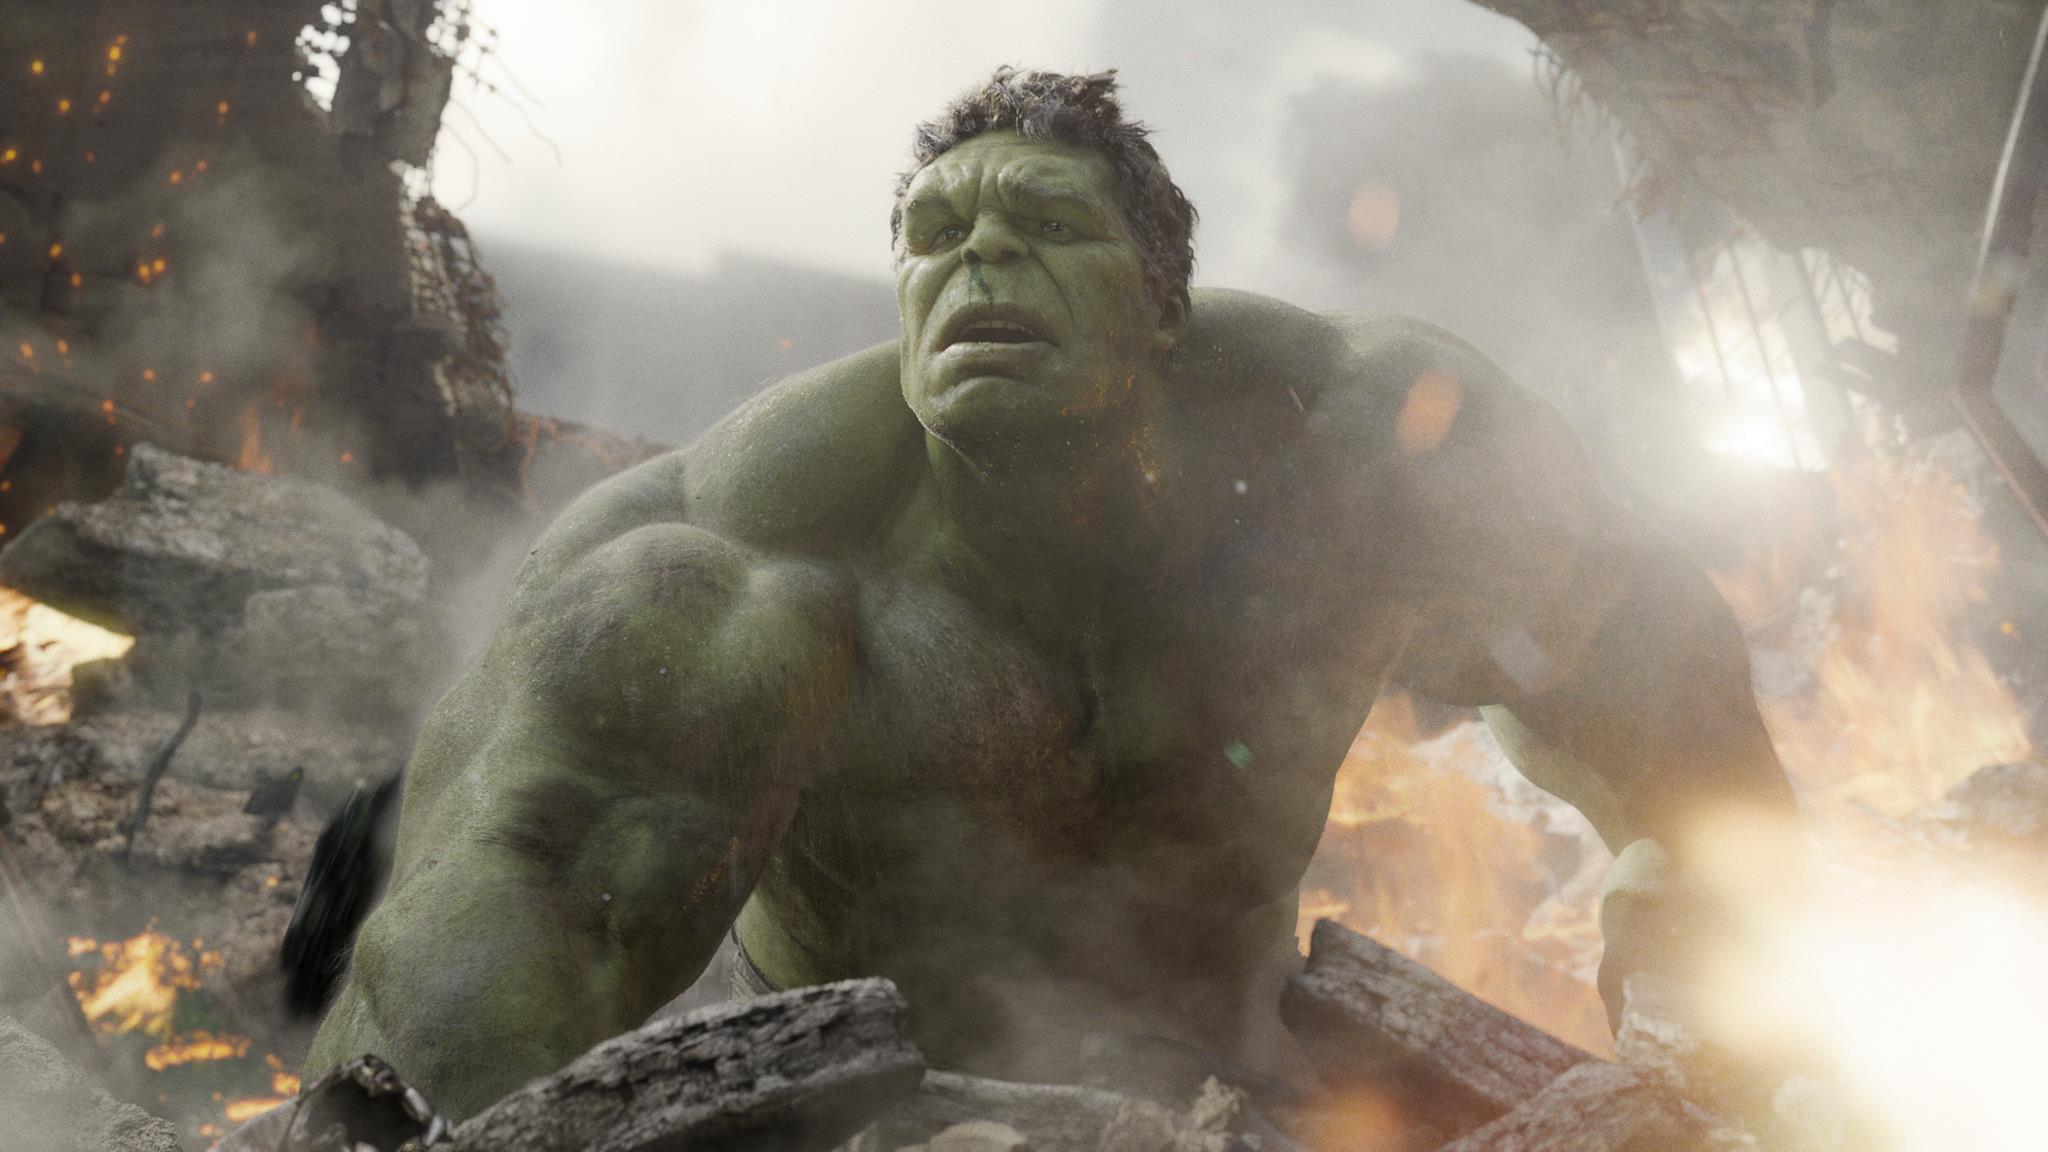 The-Incredible-Hulk-details-the-avengers-30456601-2048-1152.jpg